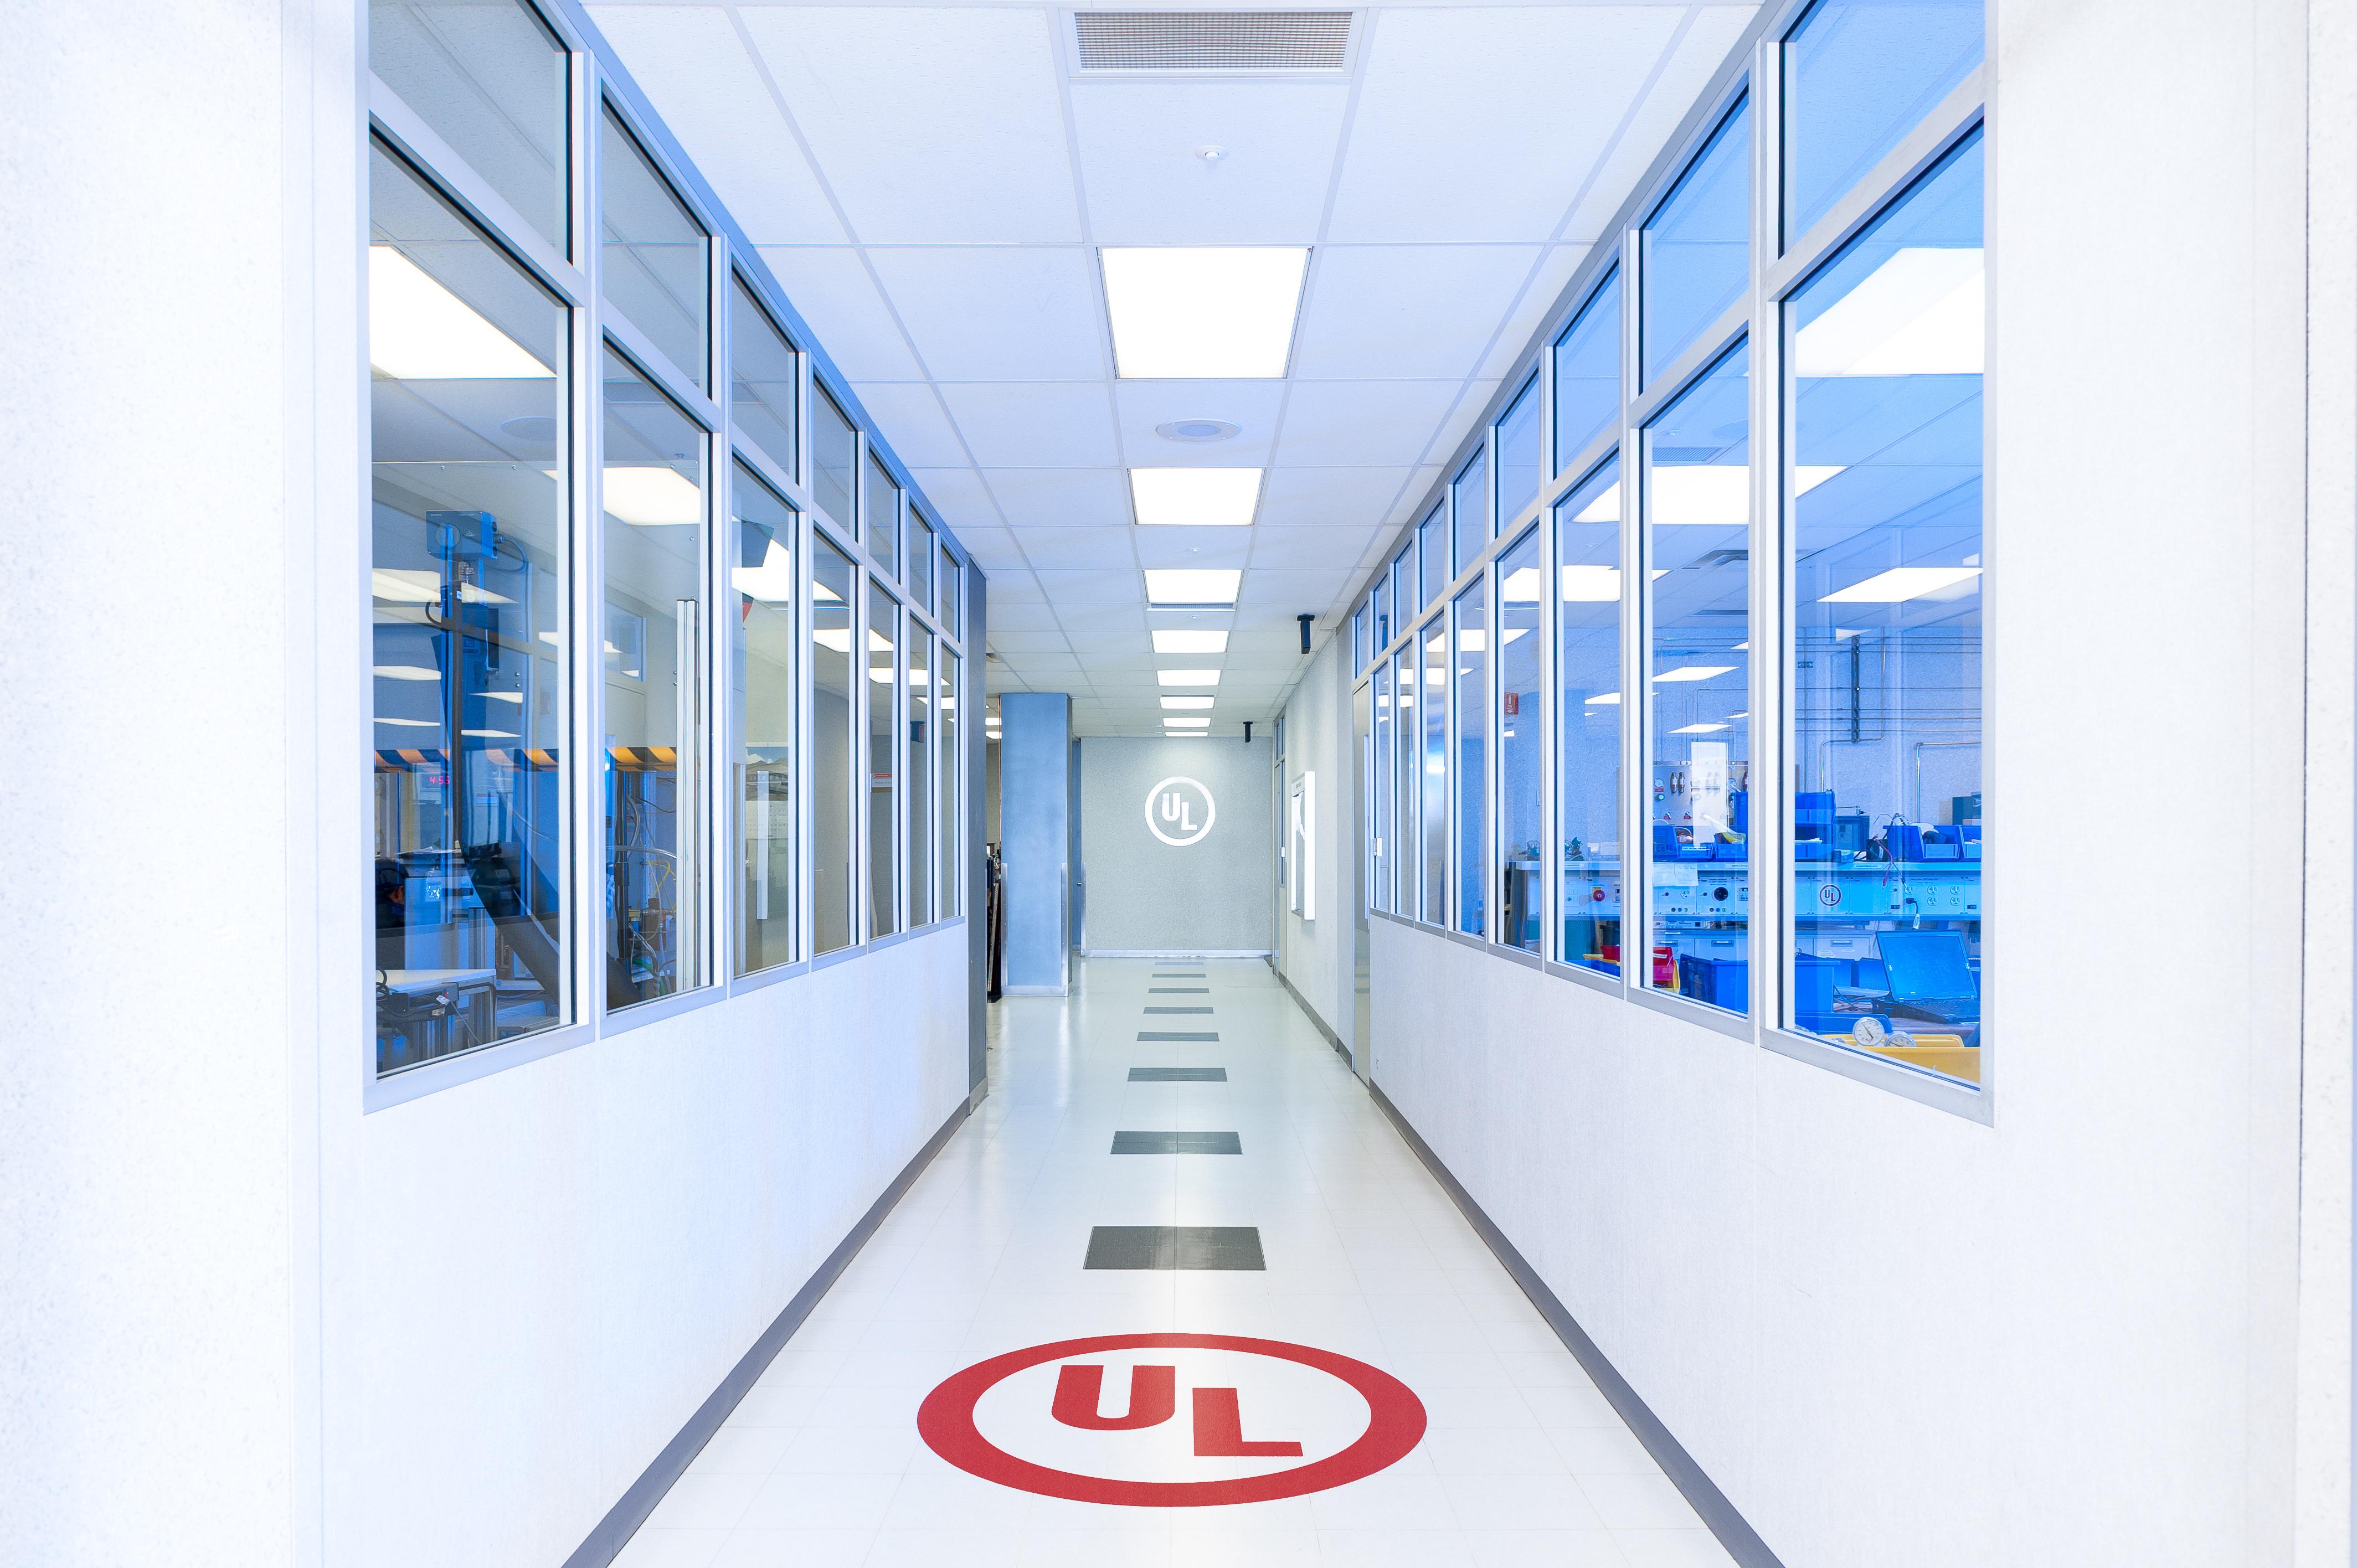 UL-Hallway-DSC_9081_Retouched.jpg